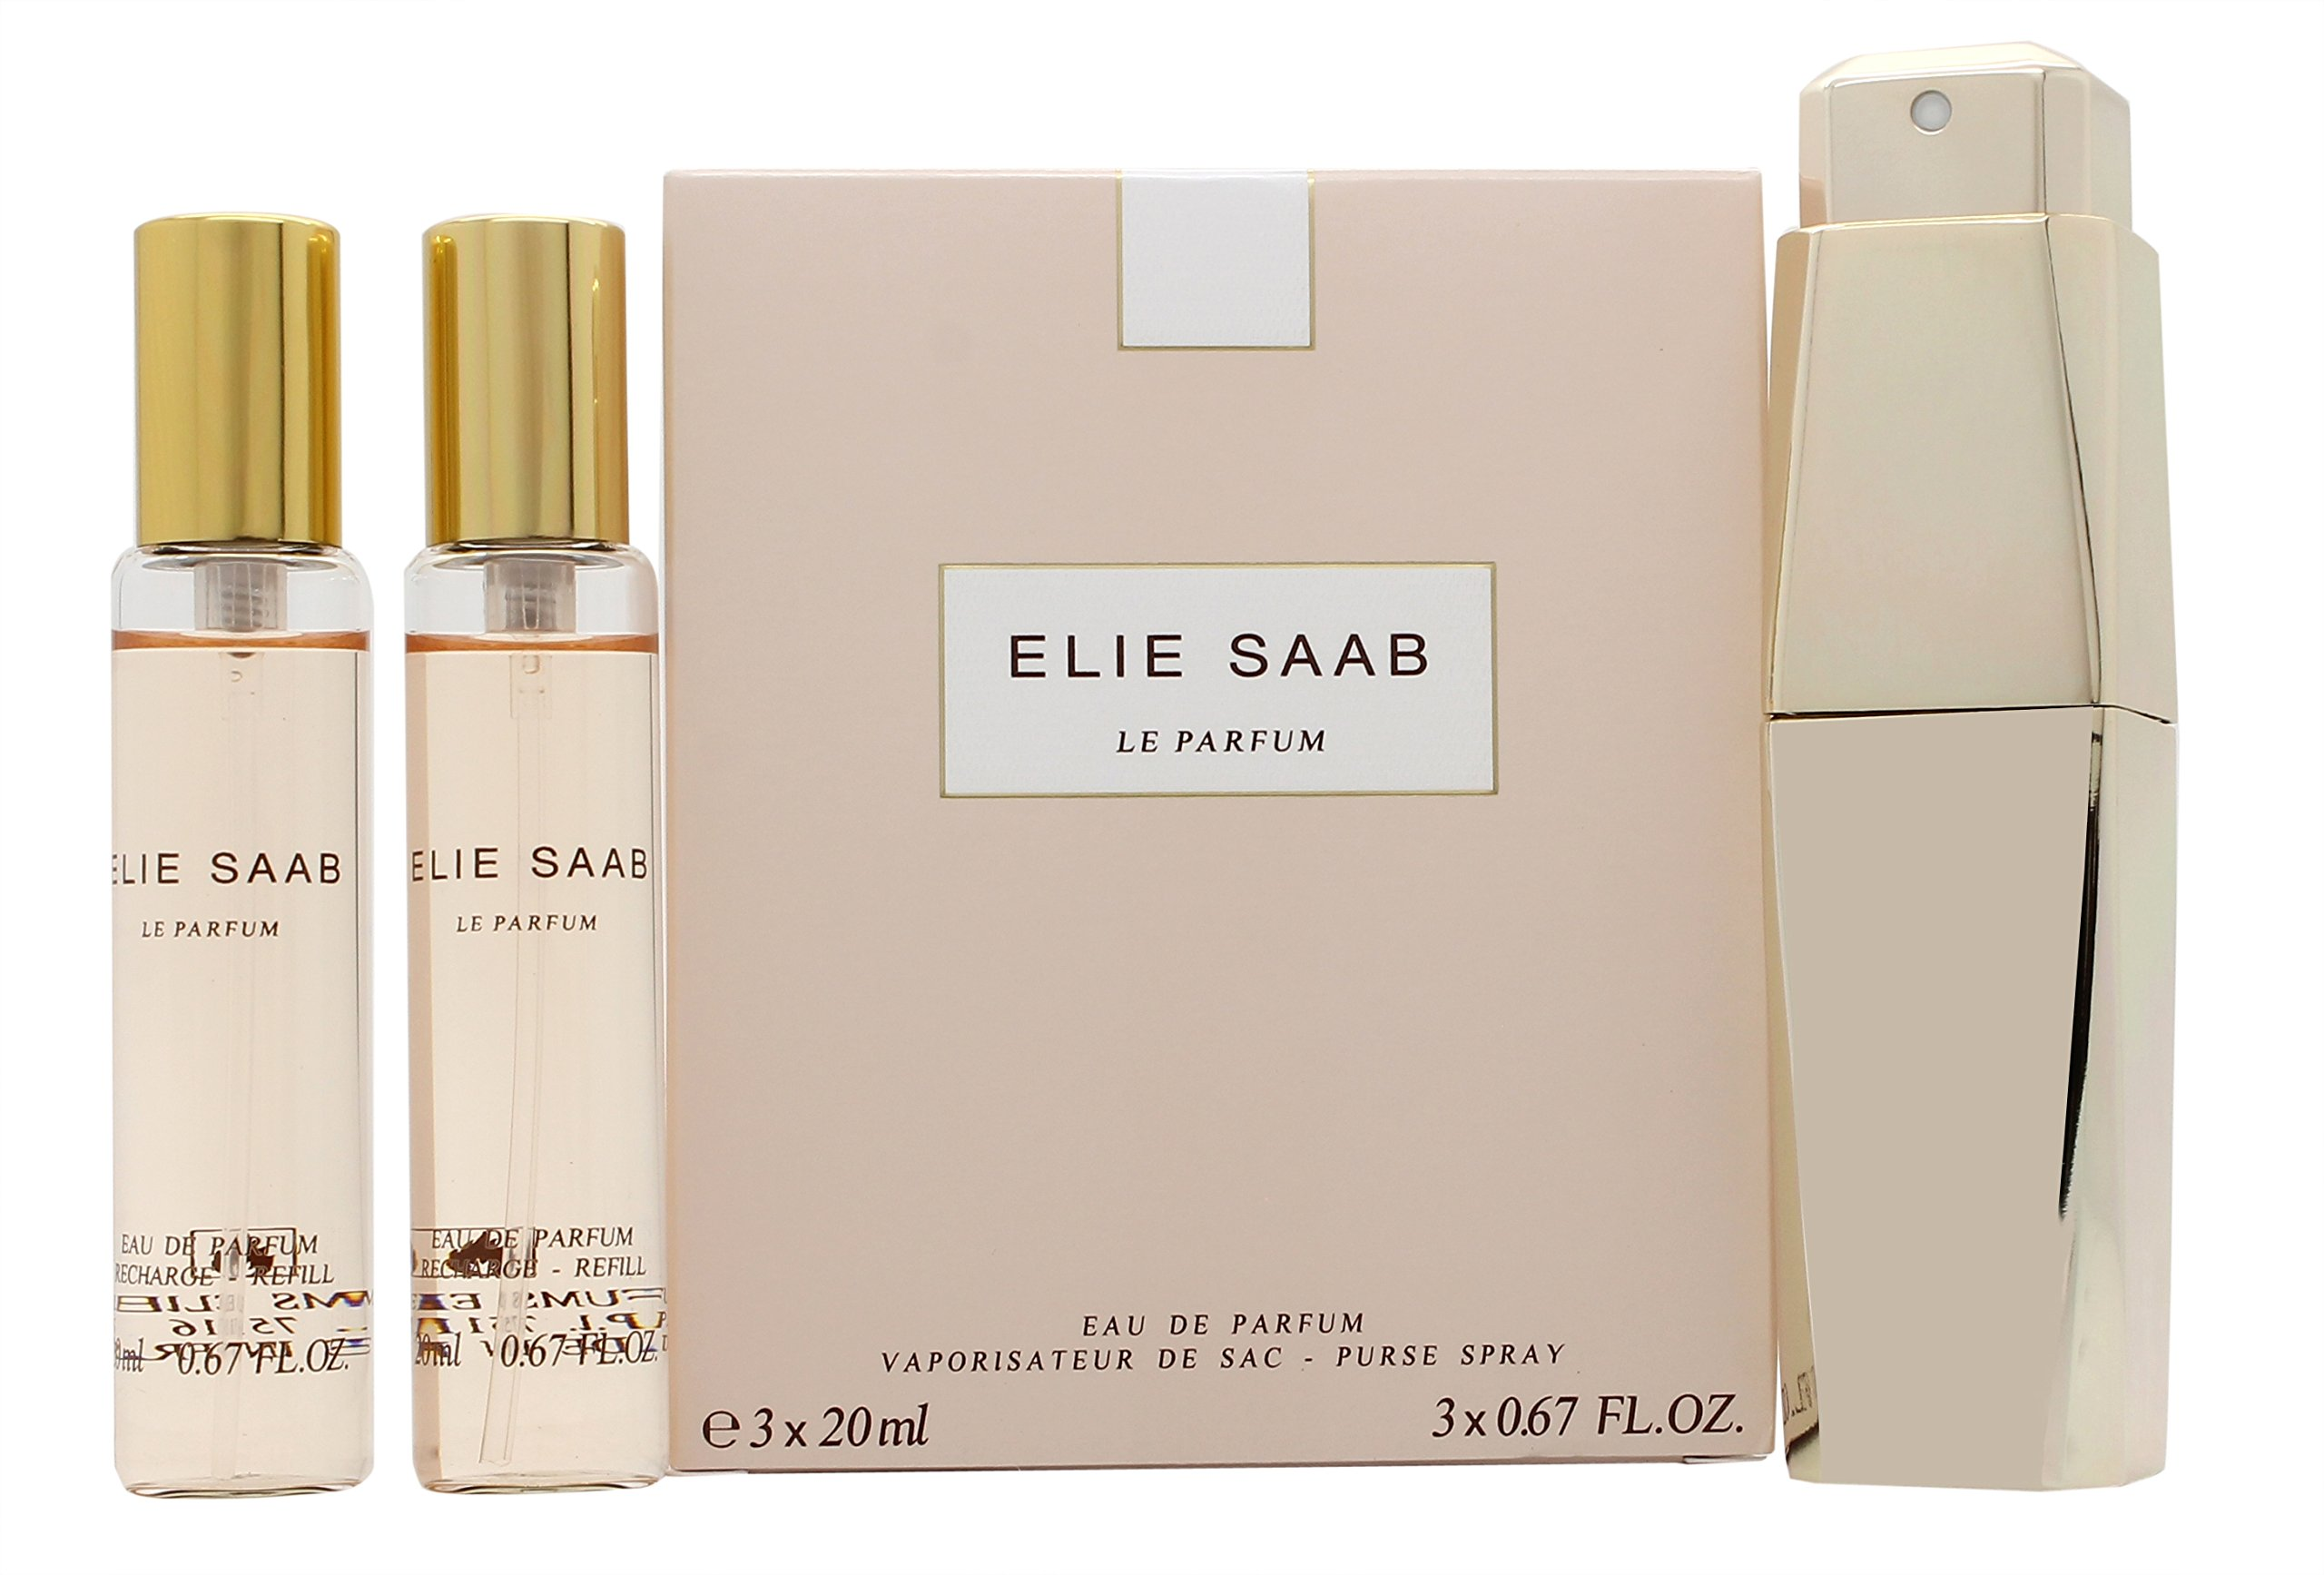 Elie Saab 3 Piece Le Parfum Purse Refill Spray Set for Women